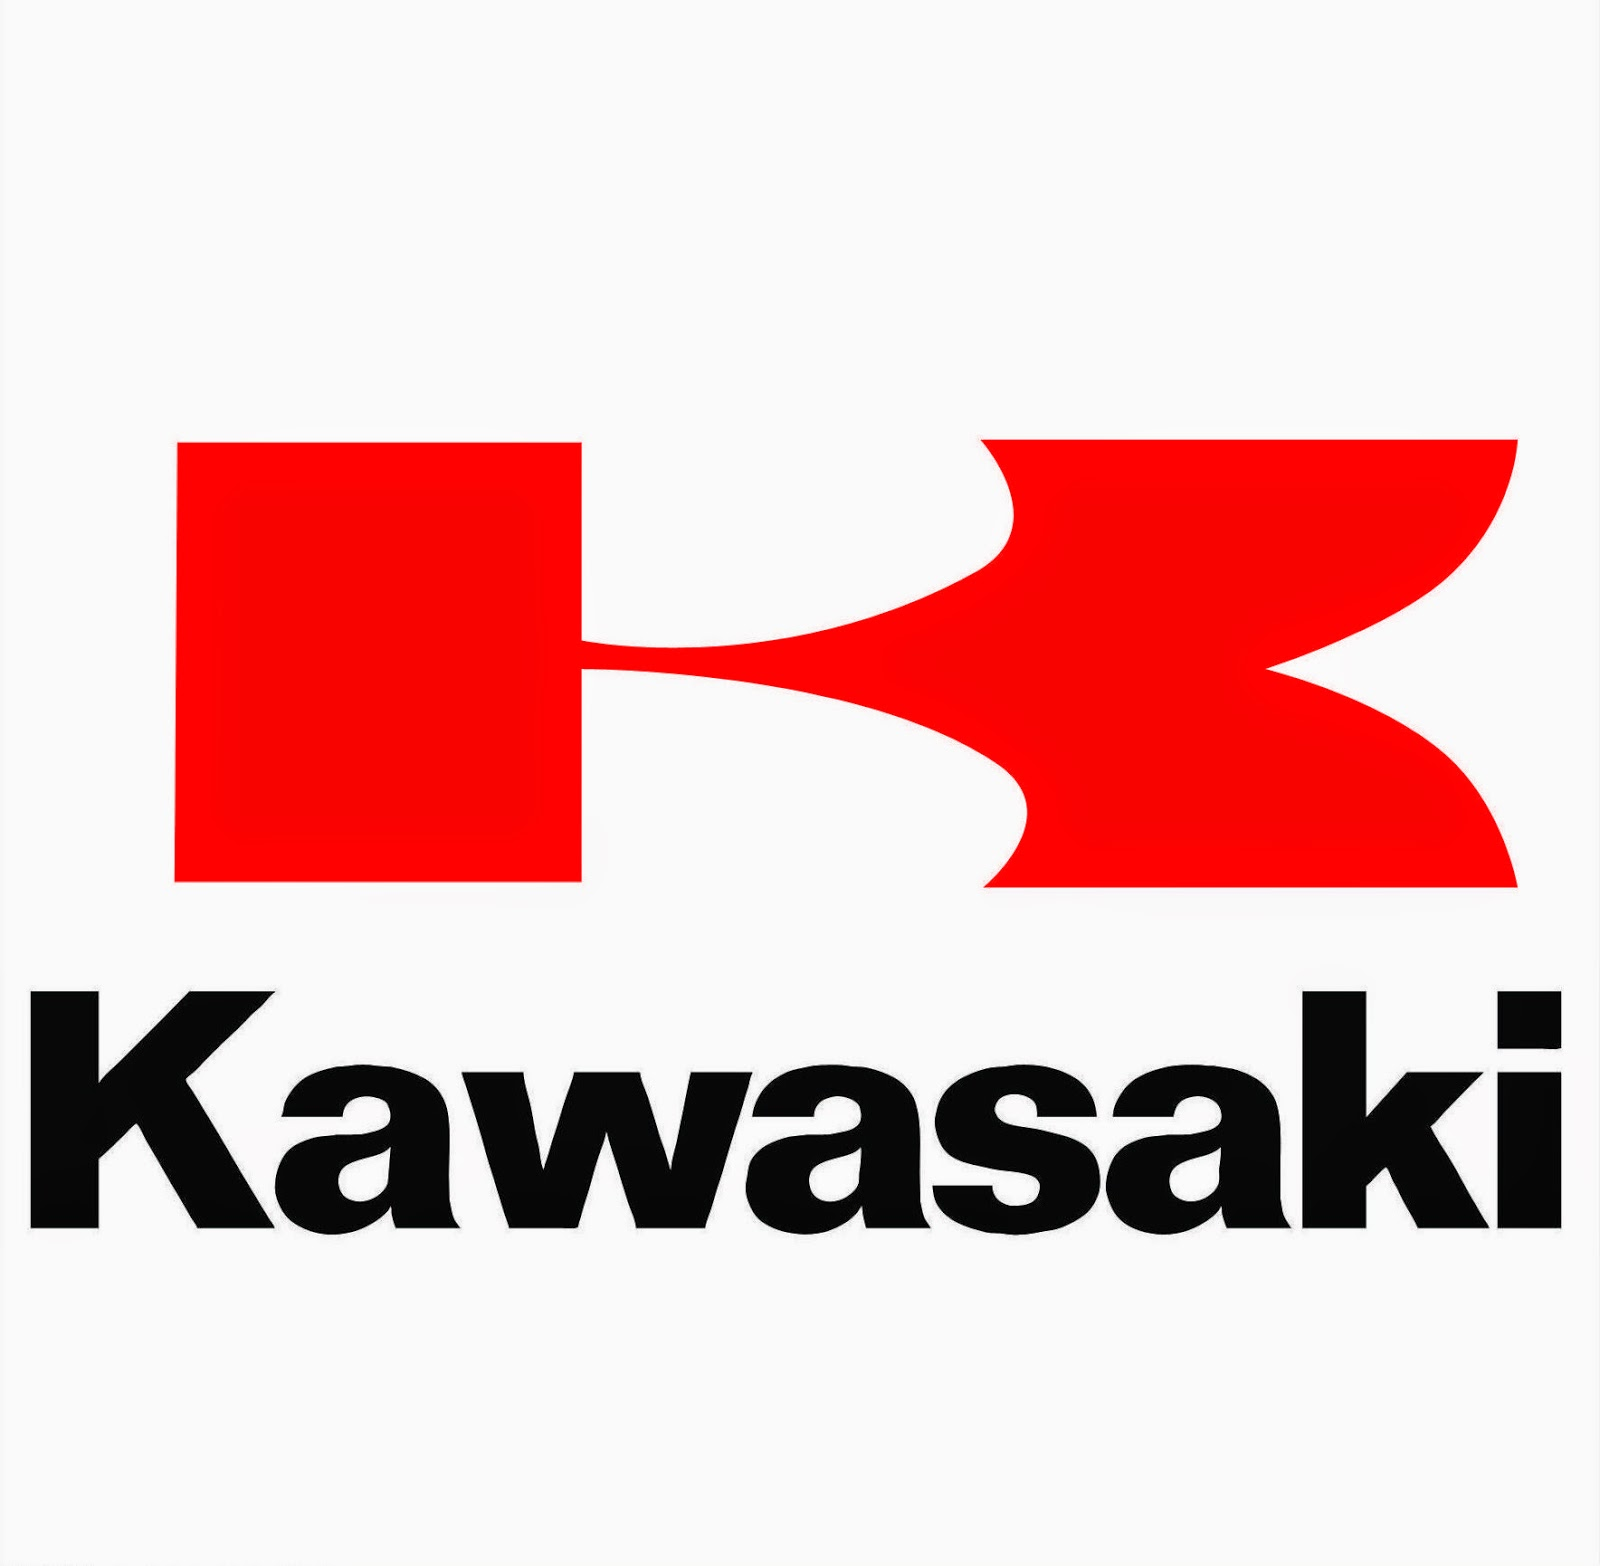 logo motor kawasaki wikipedia blackxperience.com